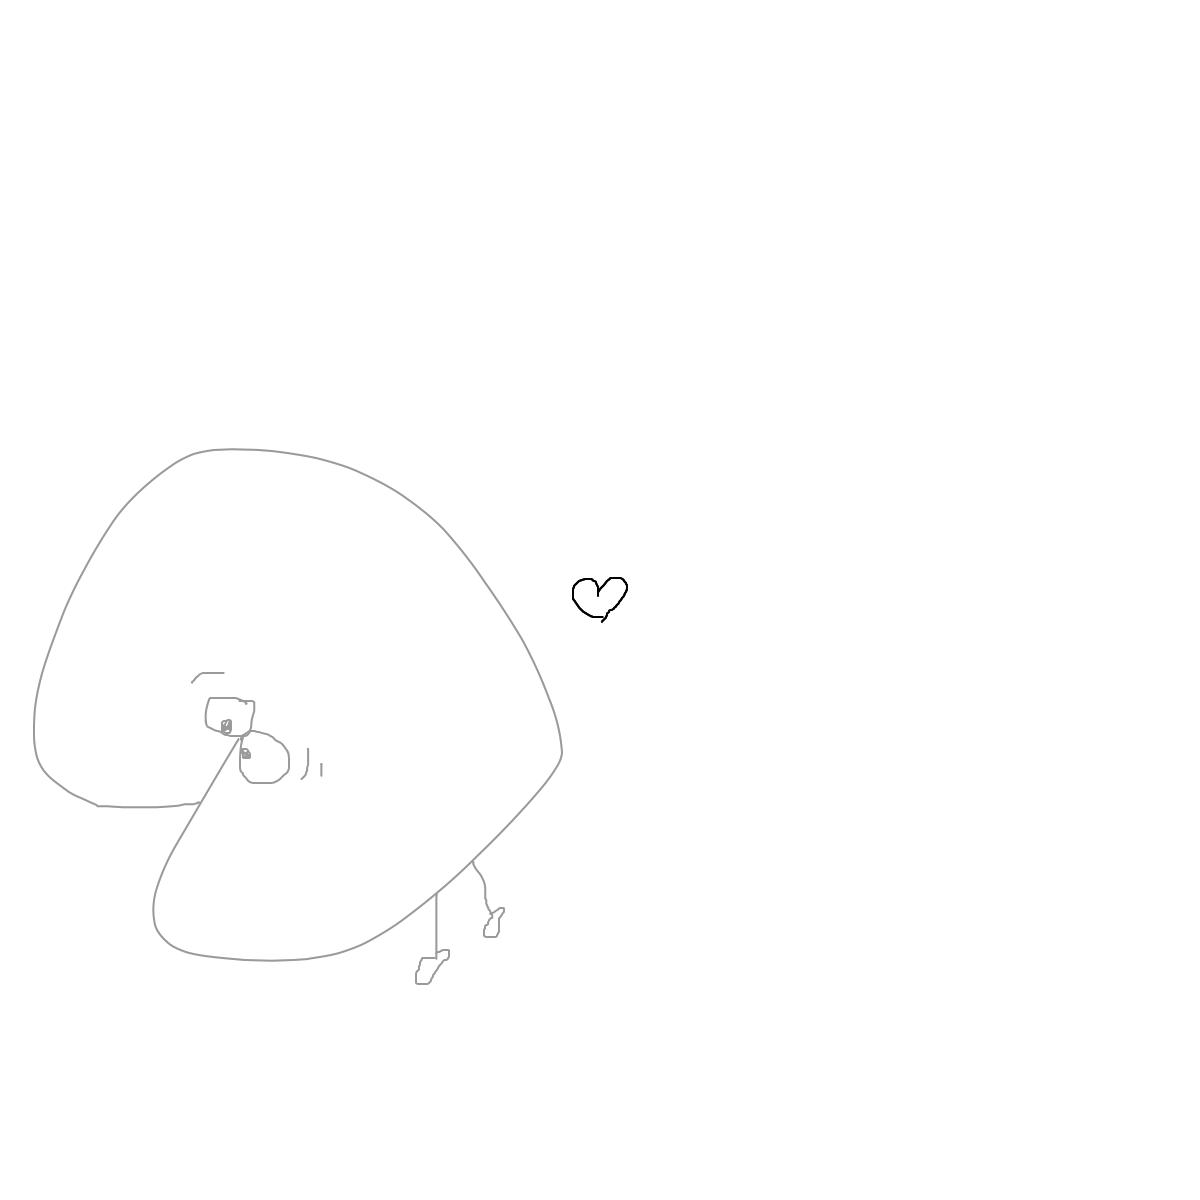 BAAAM drawing#32 lat:52.3487091064453100lng: 13.6431560516357420